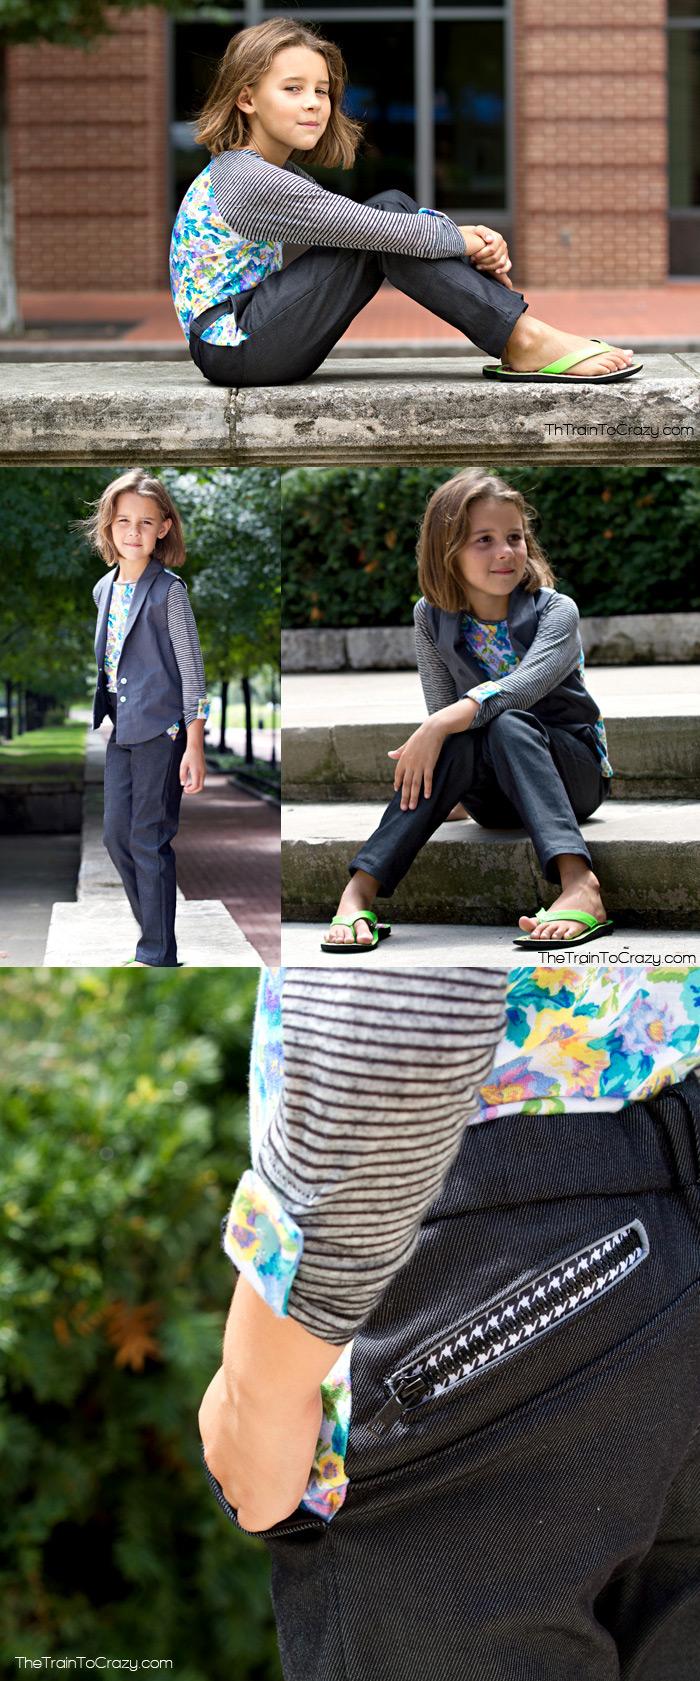 adorable school clothes patterns!